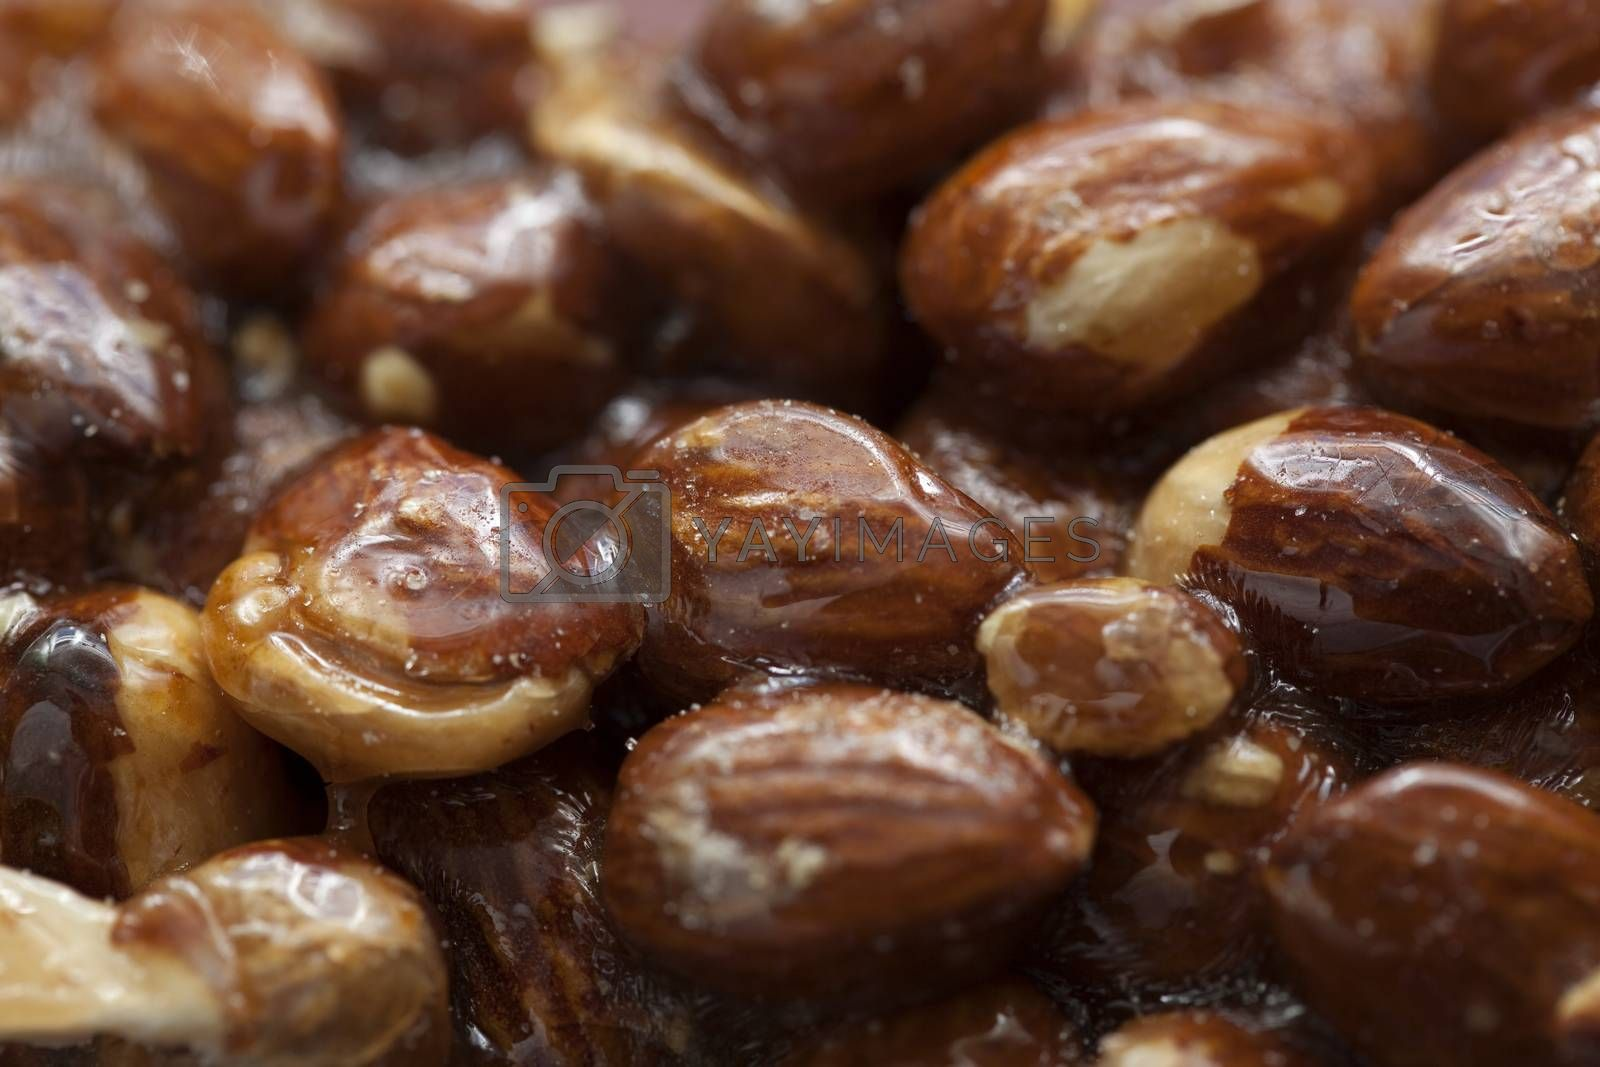 almonds in caramel by dabjola